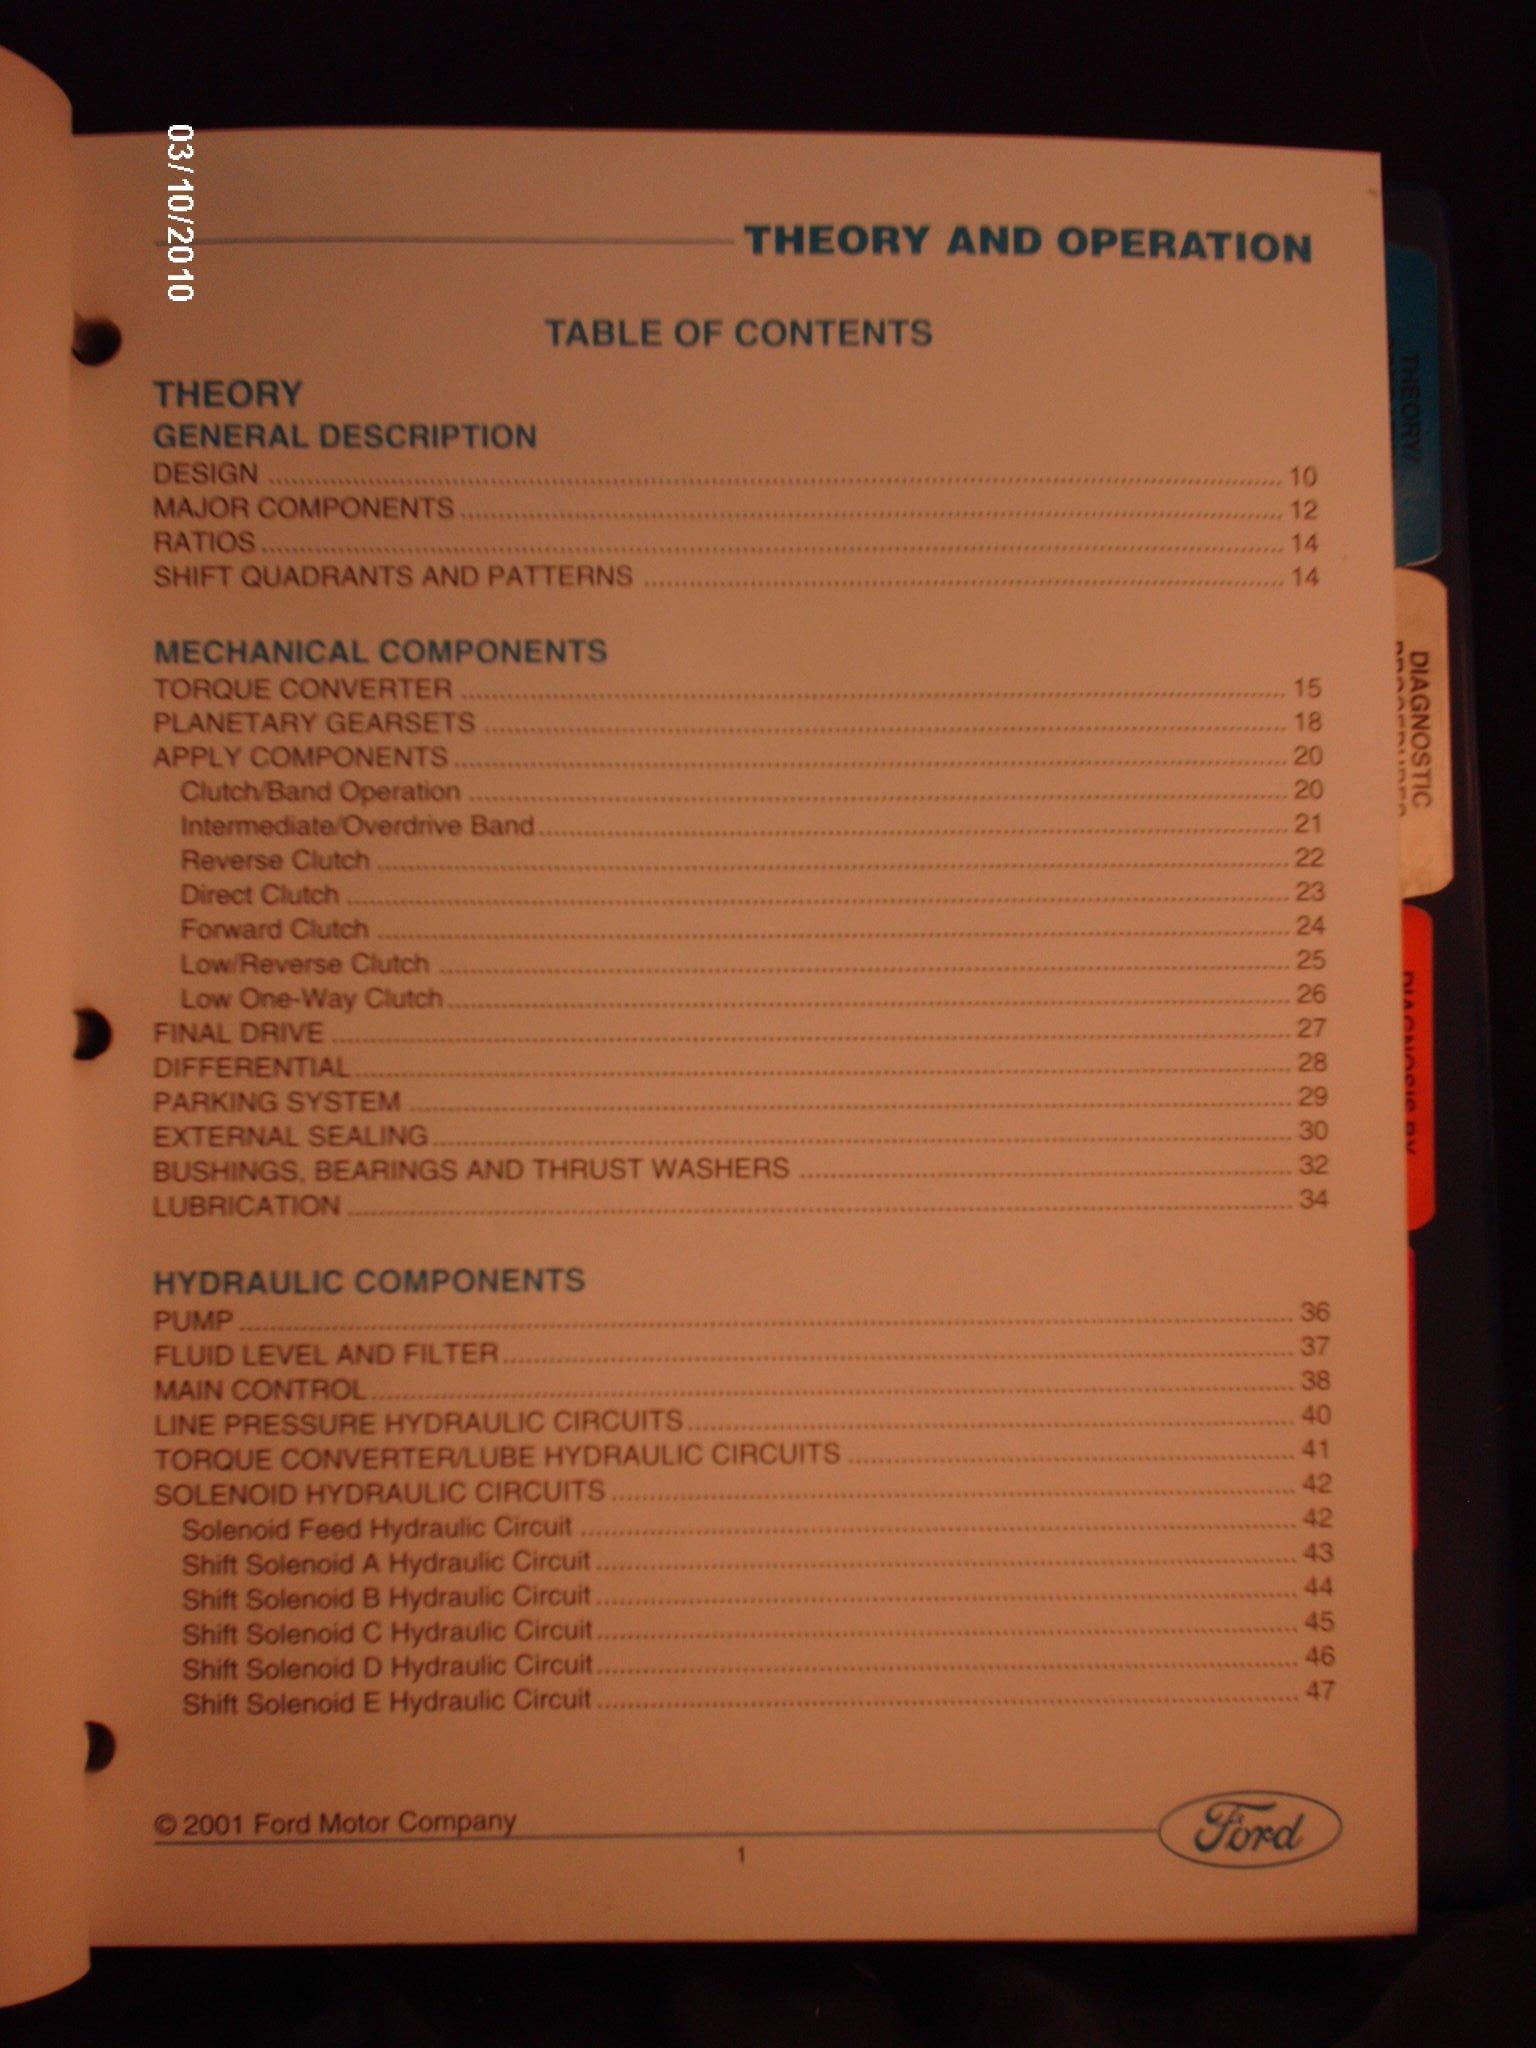 2001 Ford 4f27e Transaxle Service Manual Ptb 013 Motor Shift Solenoid B Company Books